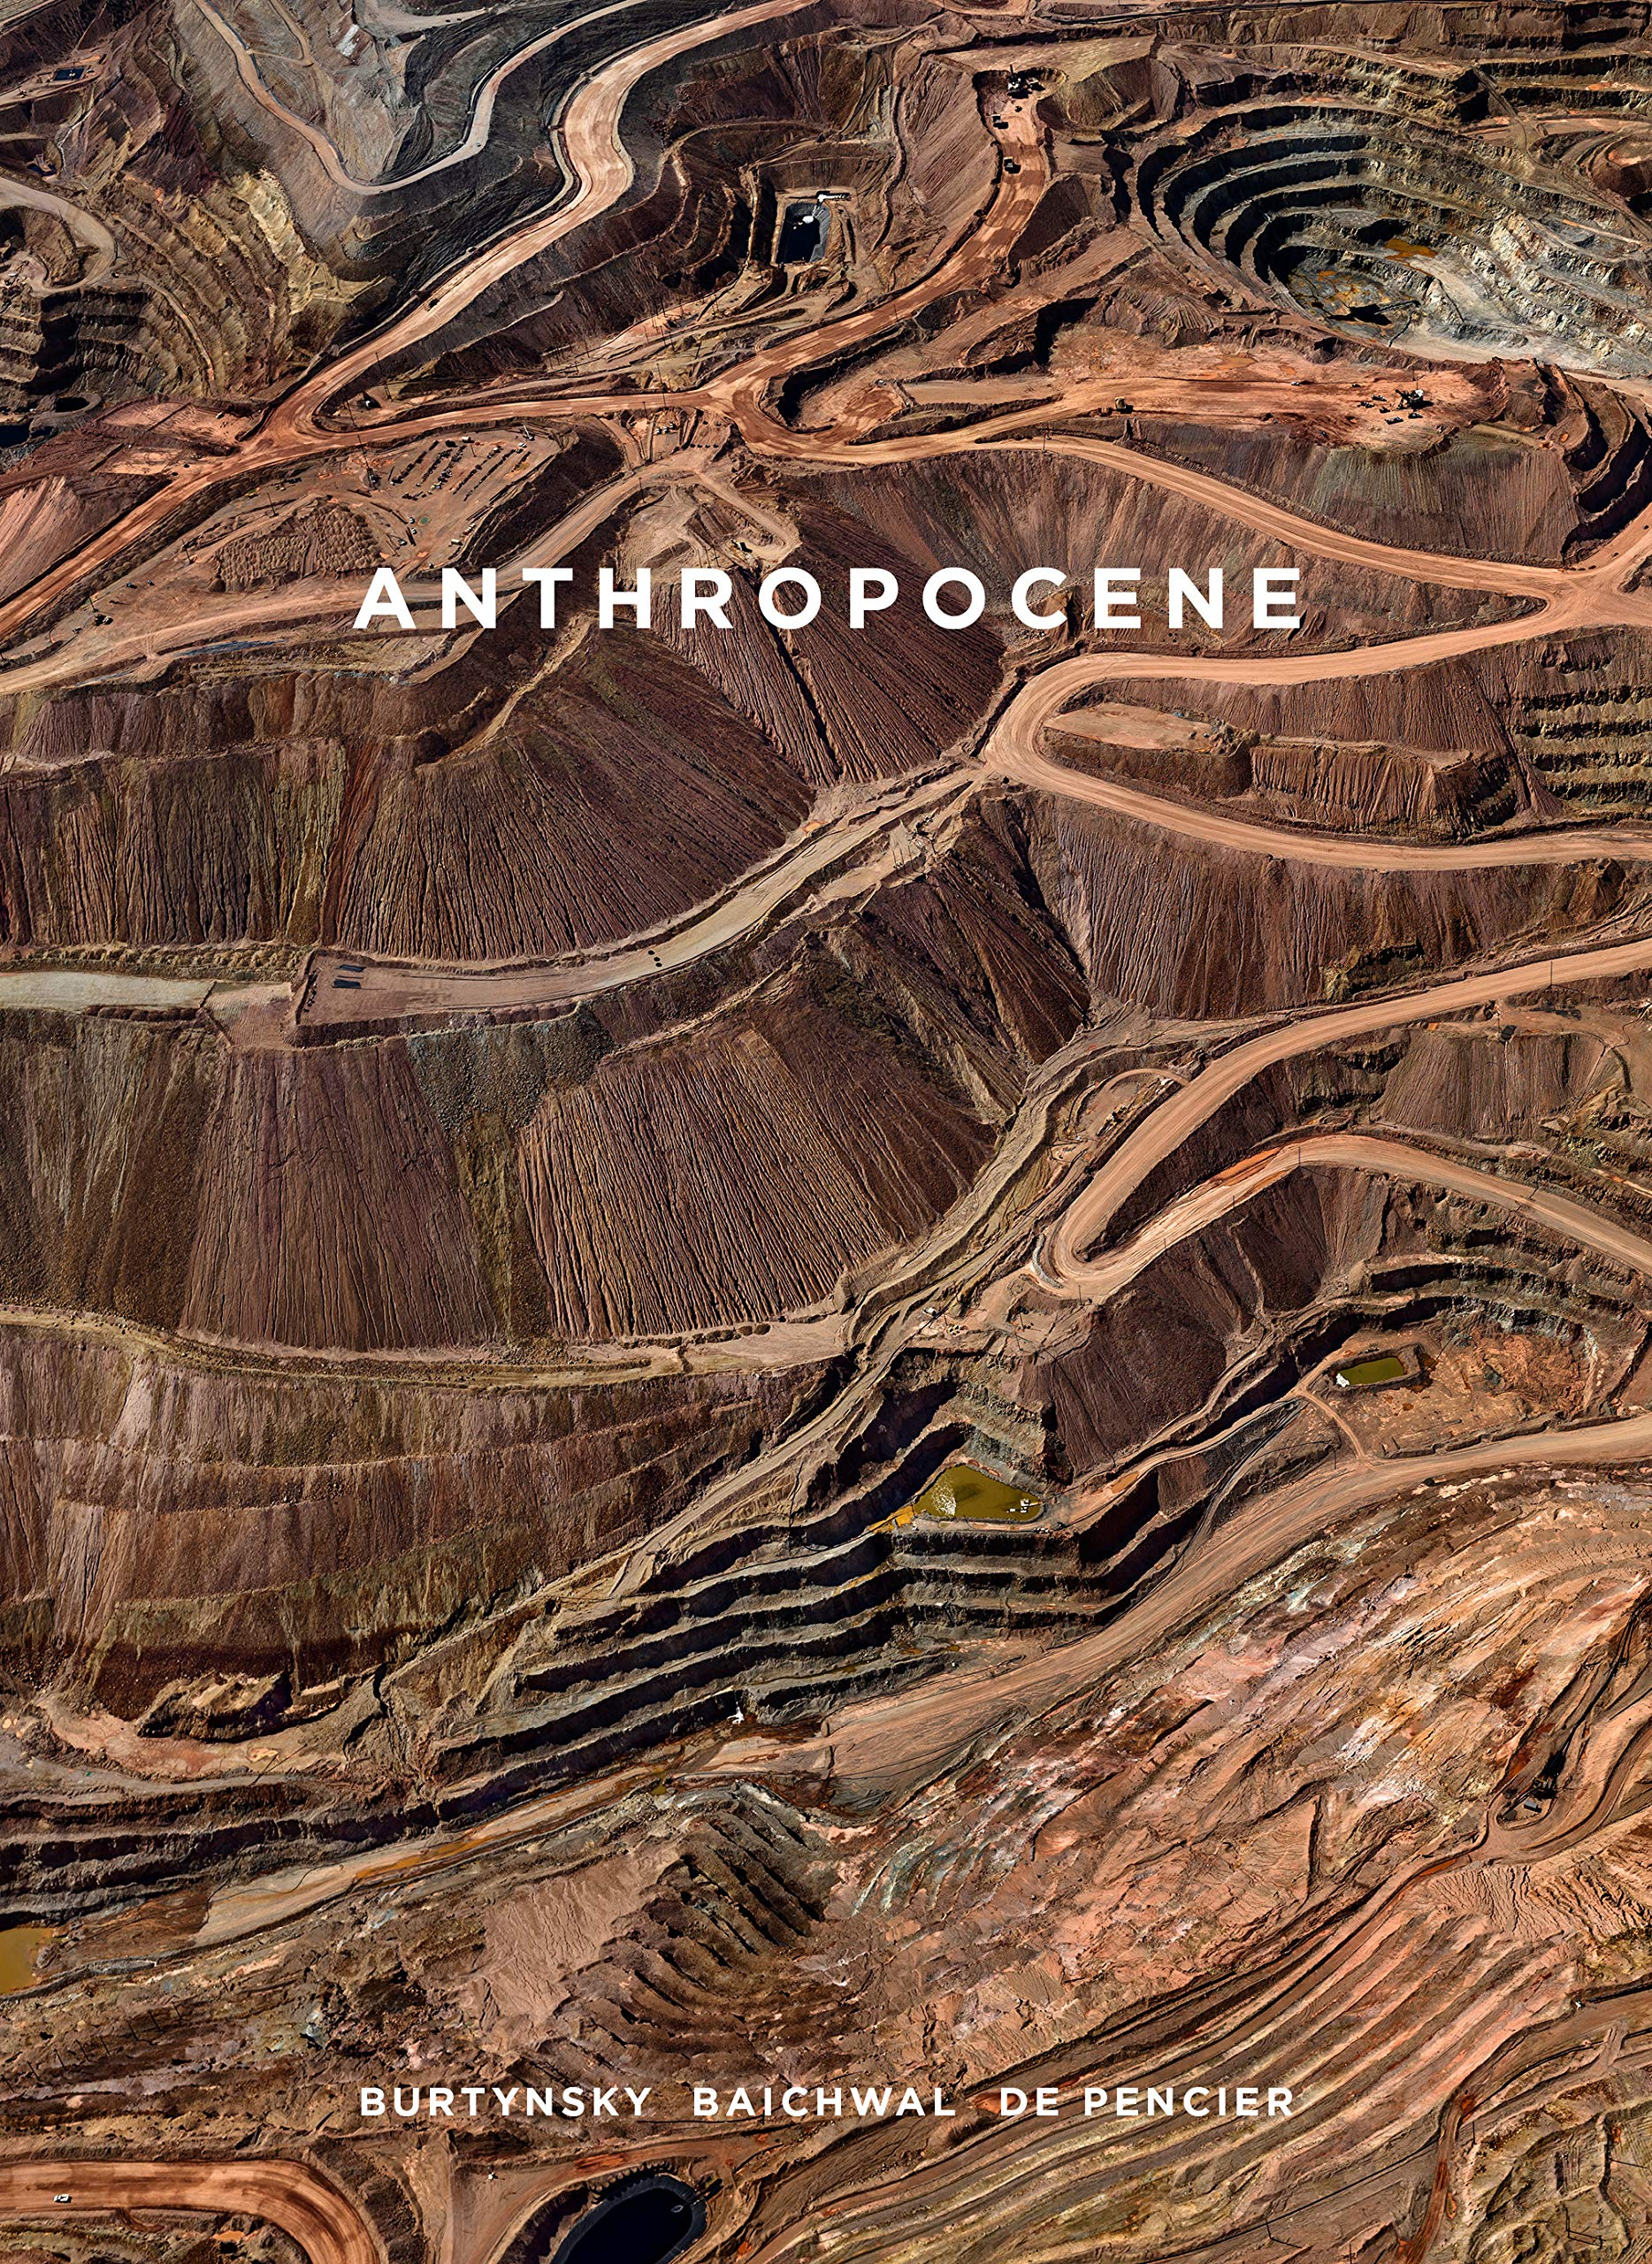 de Pencier Burtynsky Baichwal Anthropocene